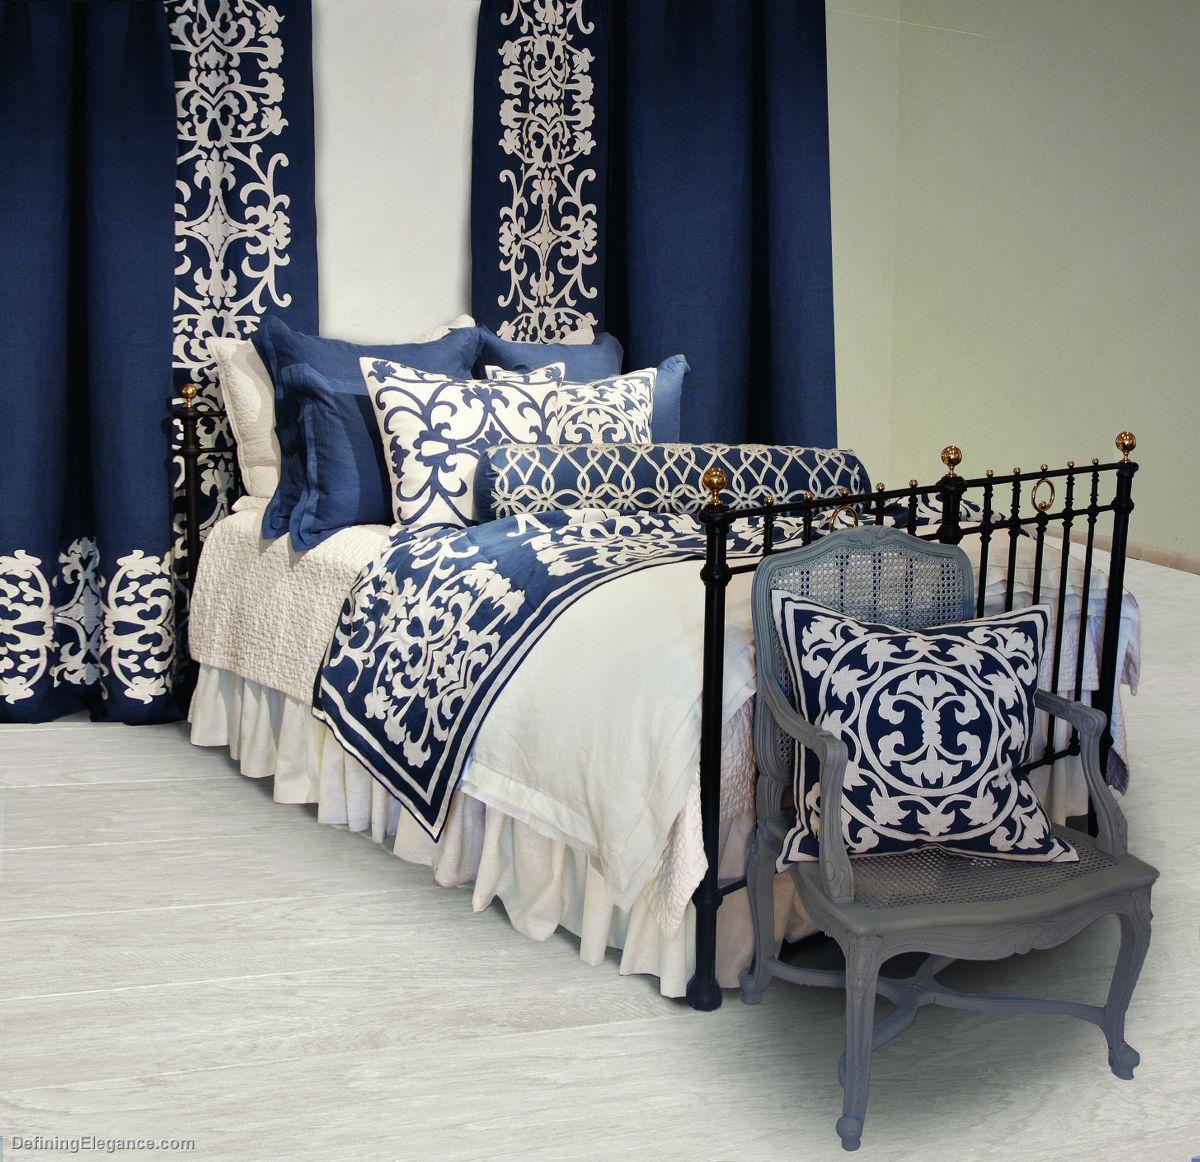 Lili Alessandra Jon L Navy Tailored Sophistication Bedding